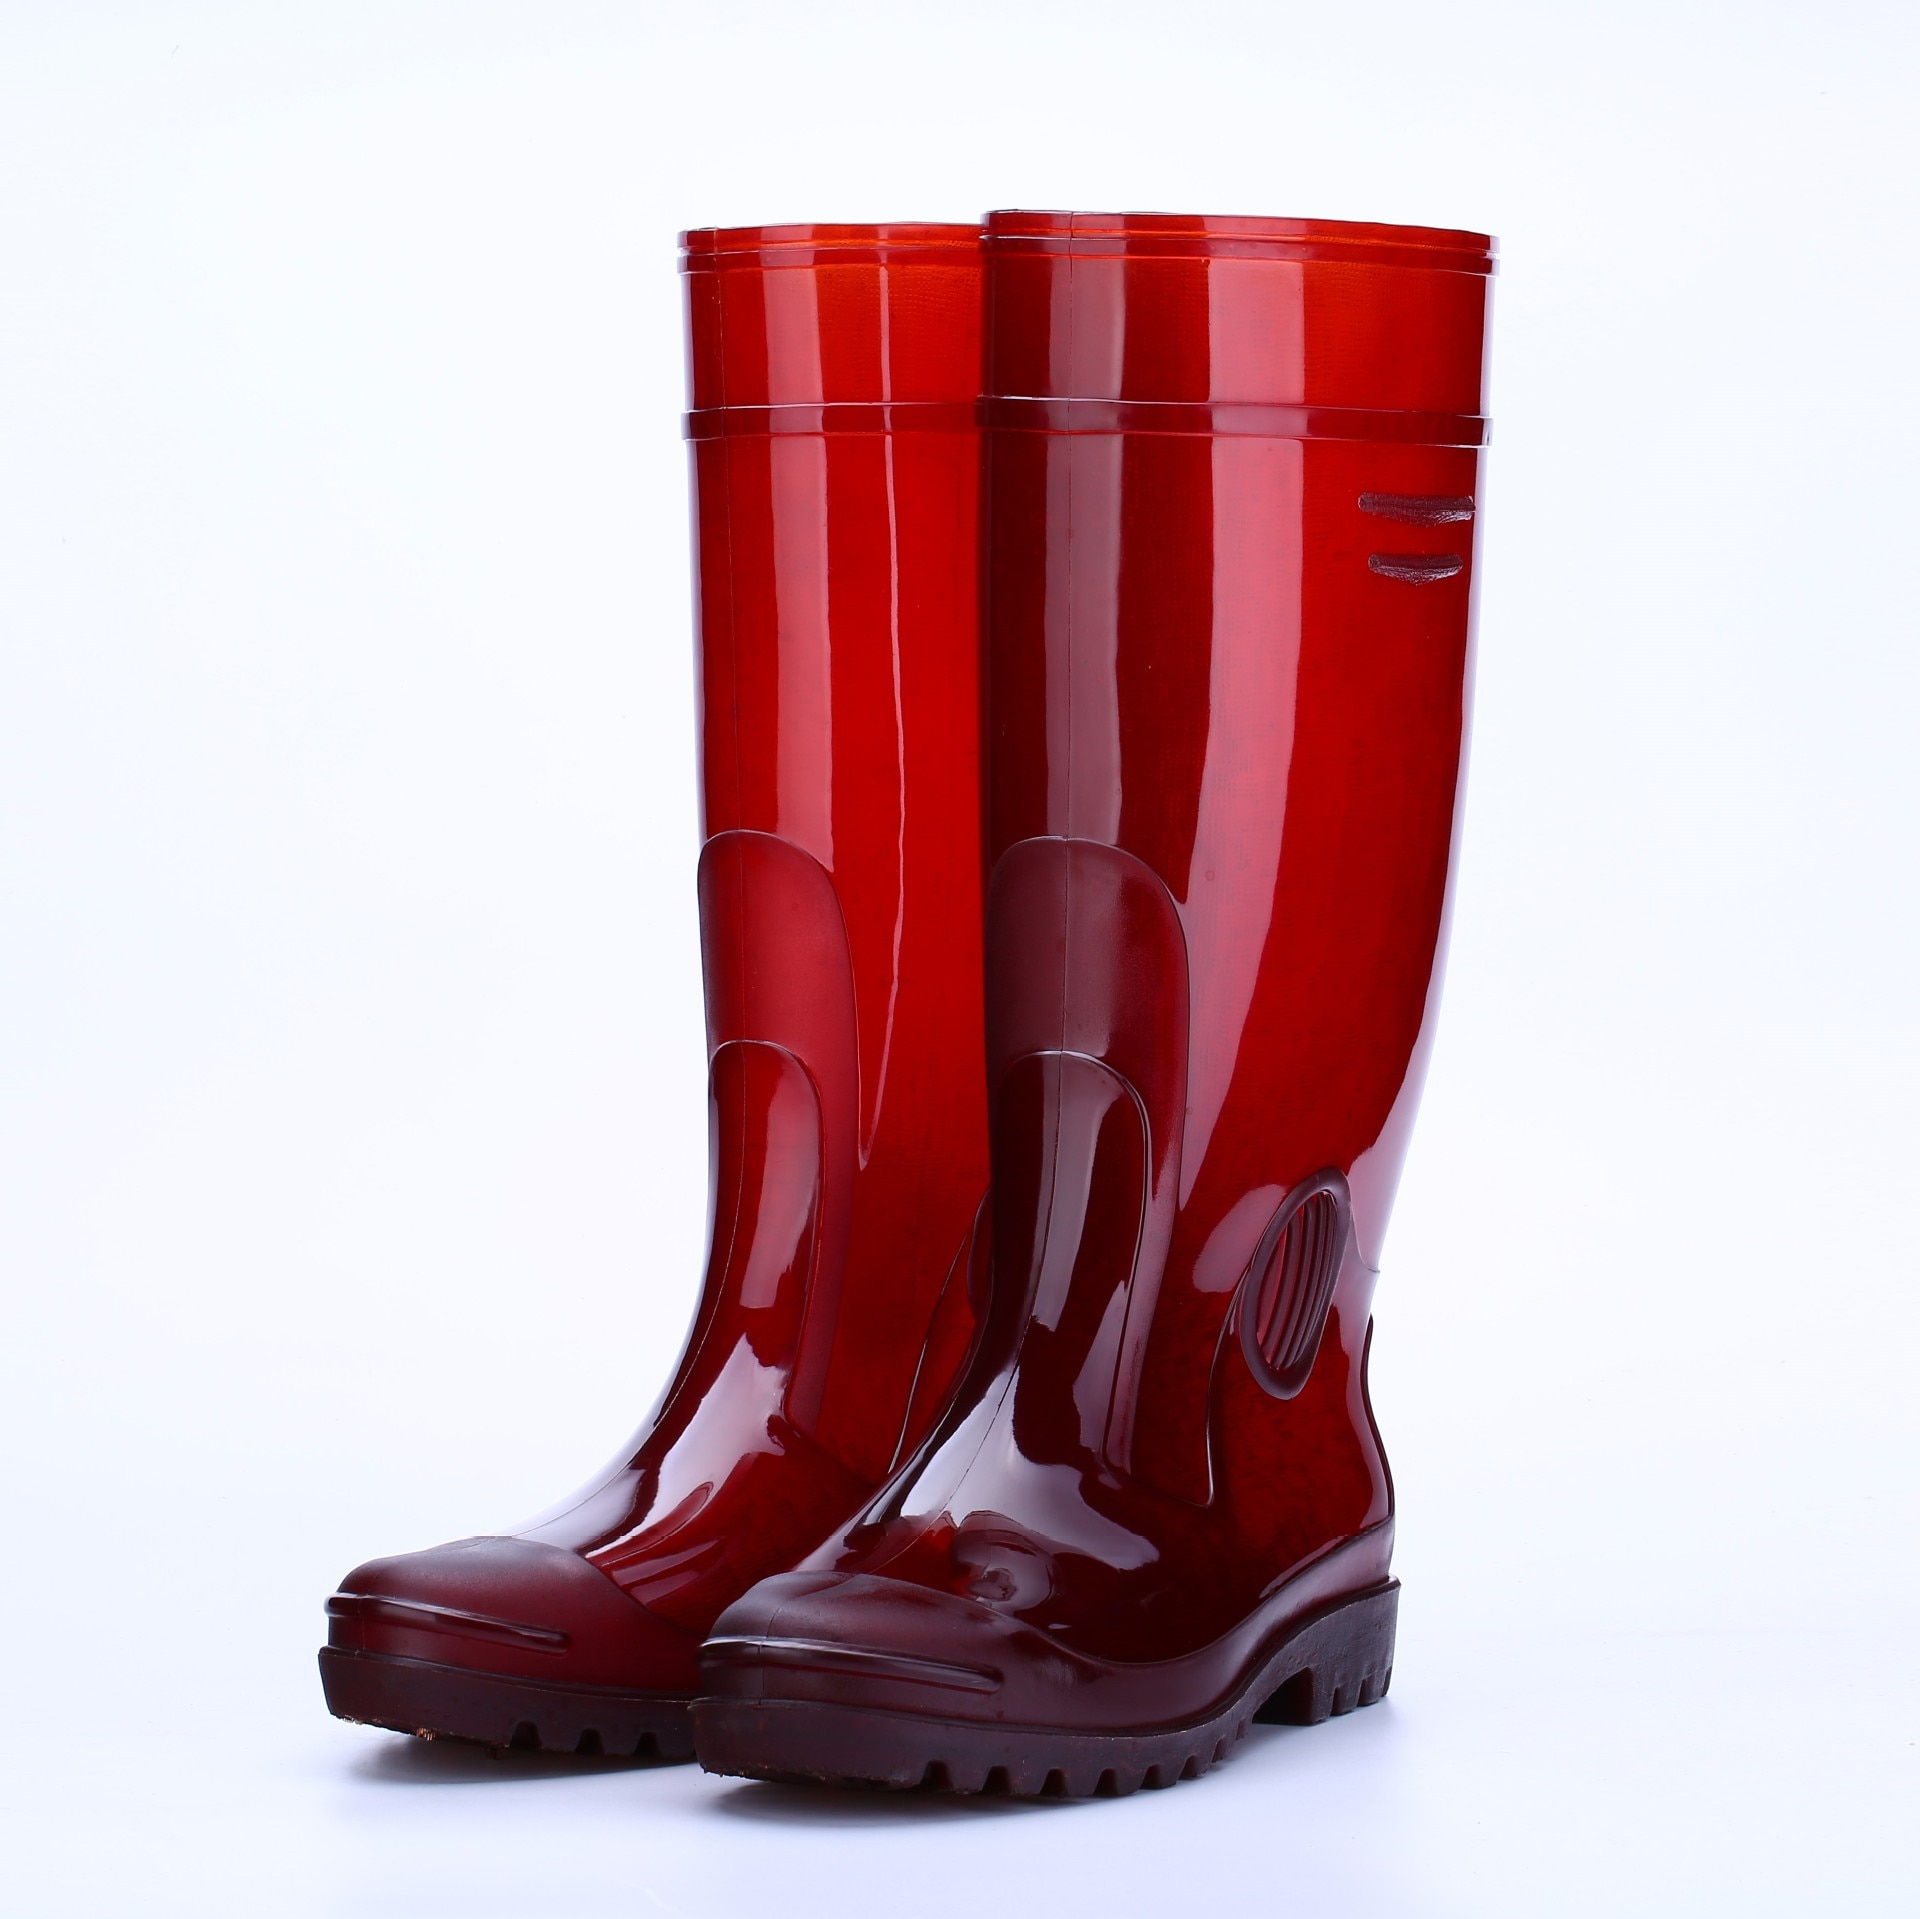 Botas de lluvia para hombre botas de agua para hombre botas de seguridad para el trabajo zapatos de plástico para trabajo impermeables antideslizantes ácido y álcali Re